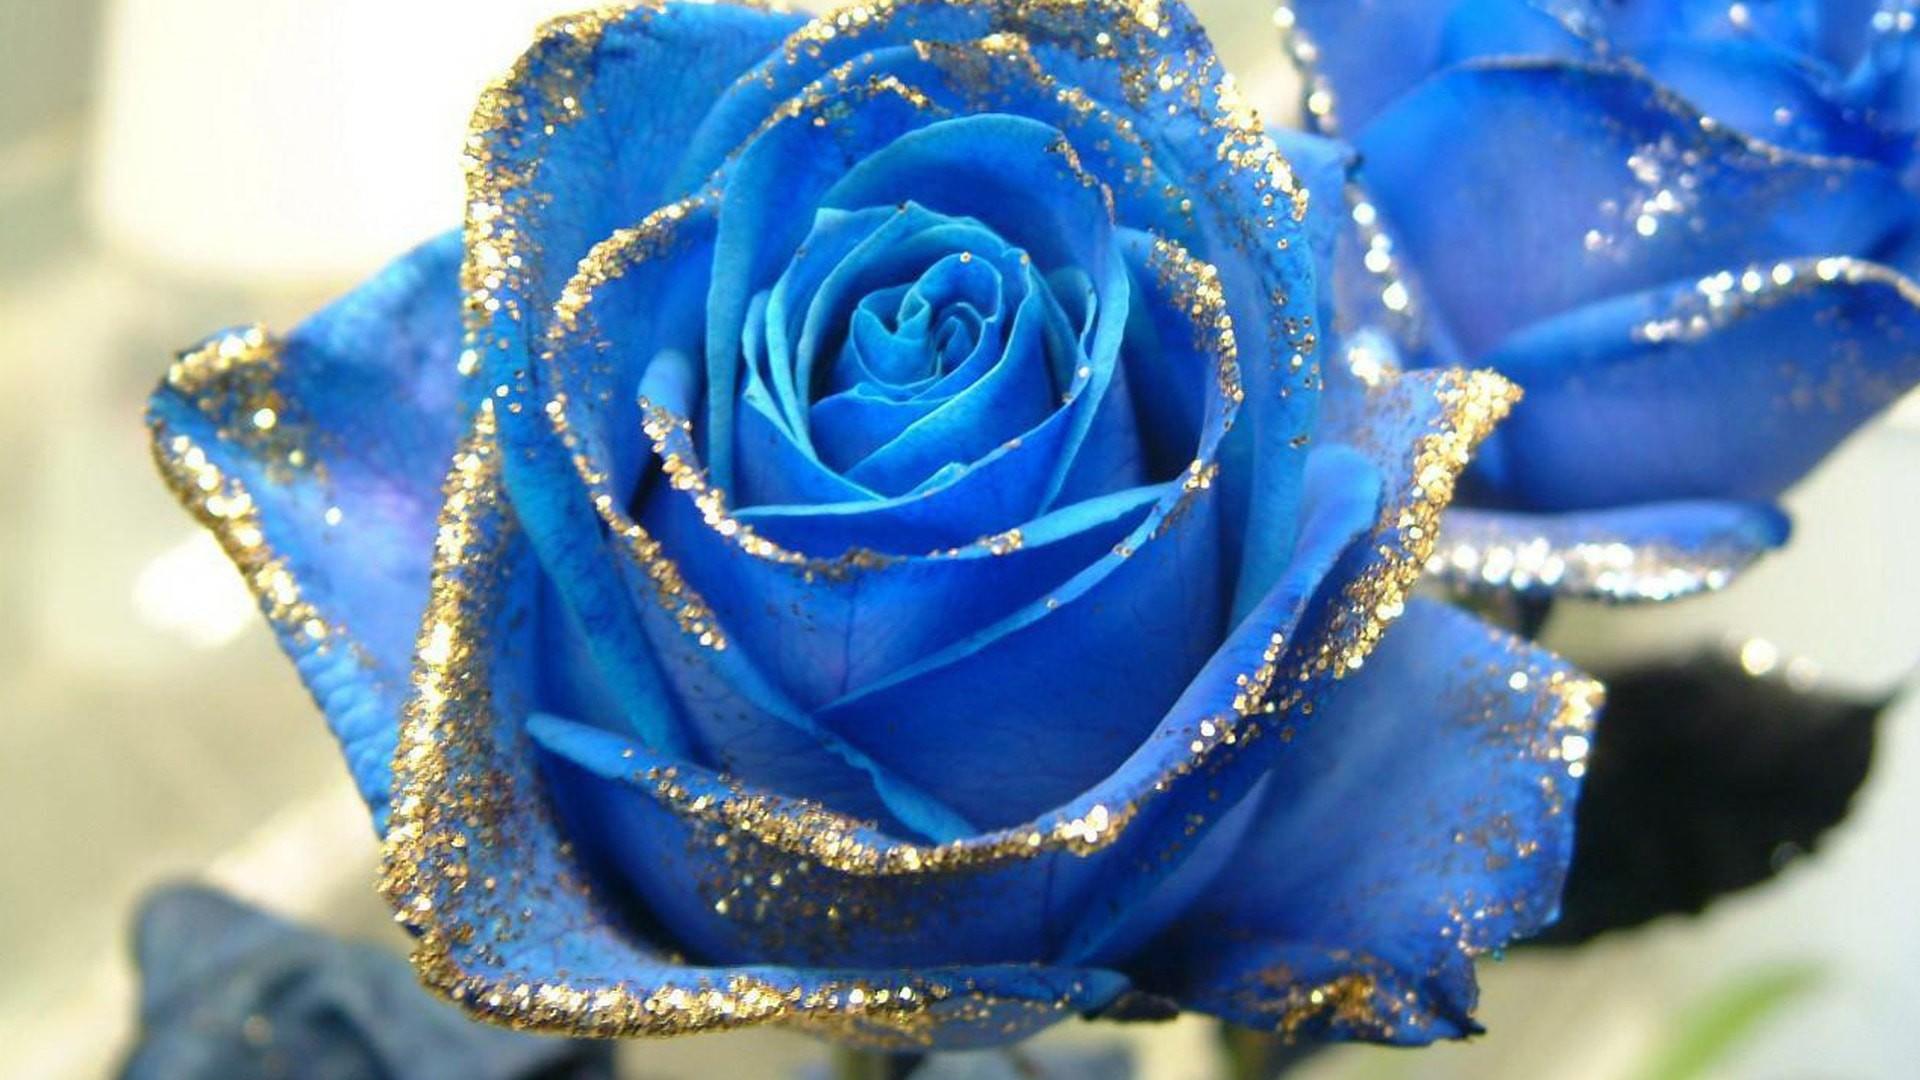 1920x1080 Blue Rose HD Pics Wallpapers Hd